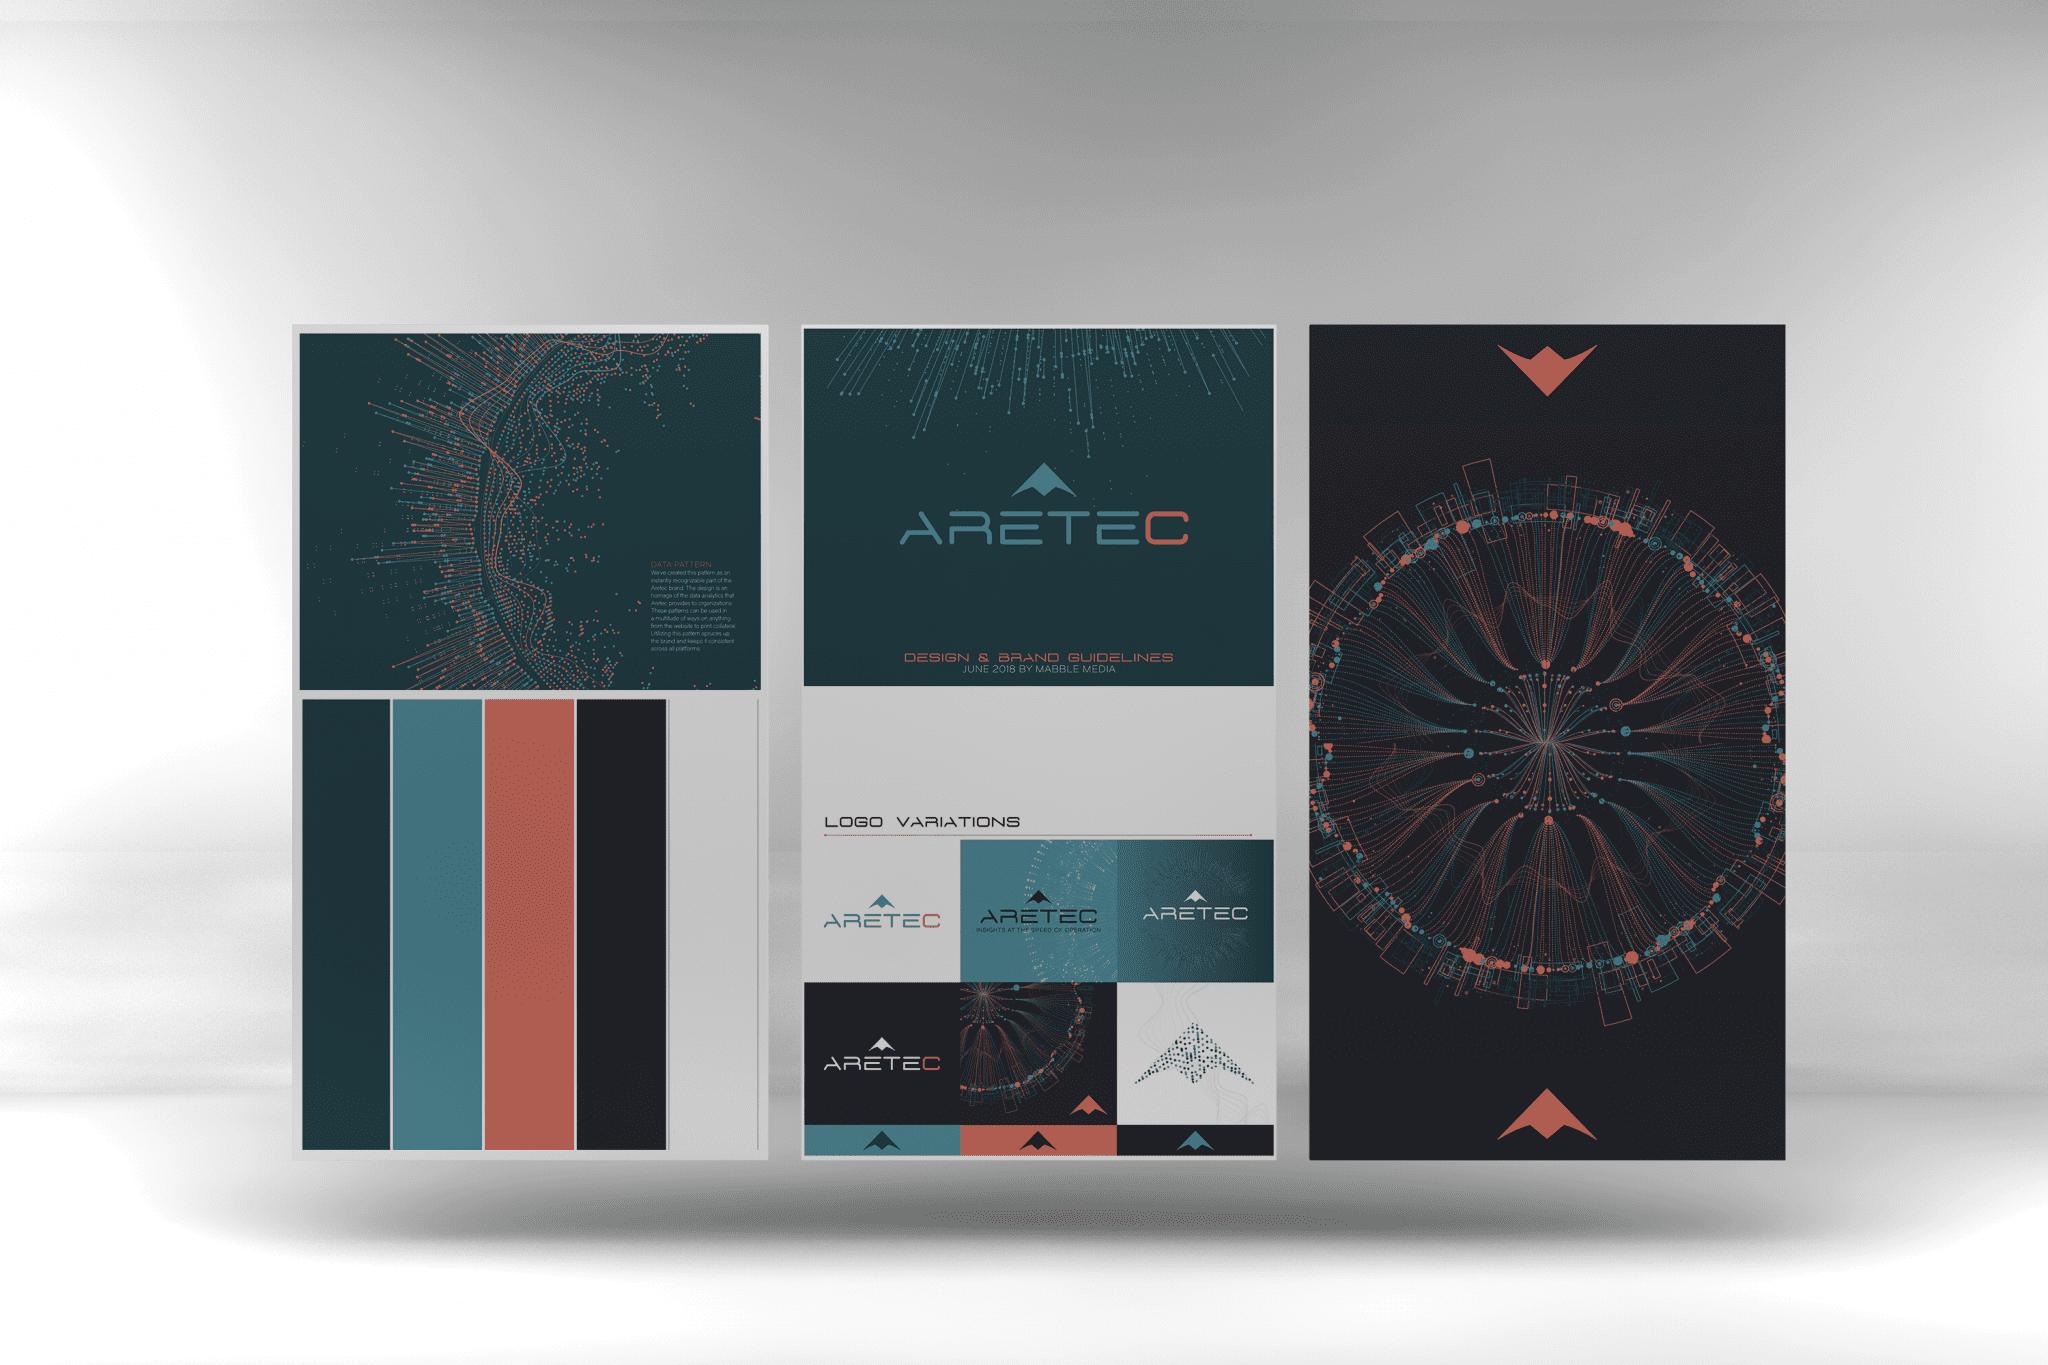 Mabble Media - Creative Agency | Aretec Logo | Brand Guide | Print